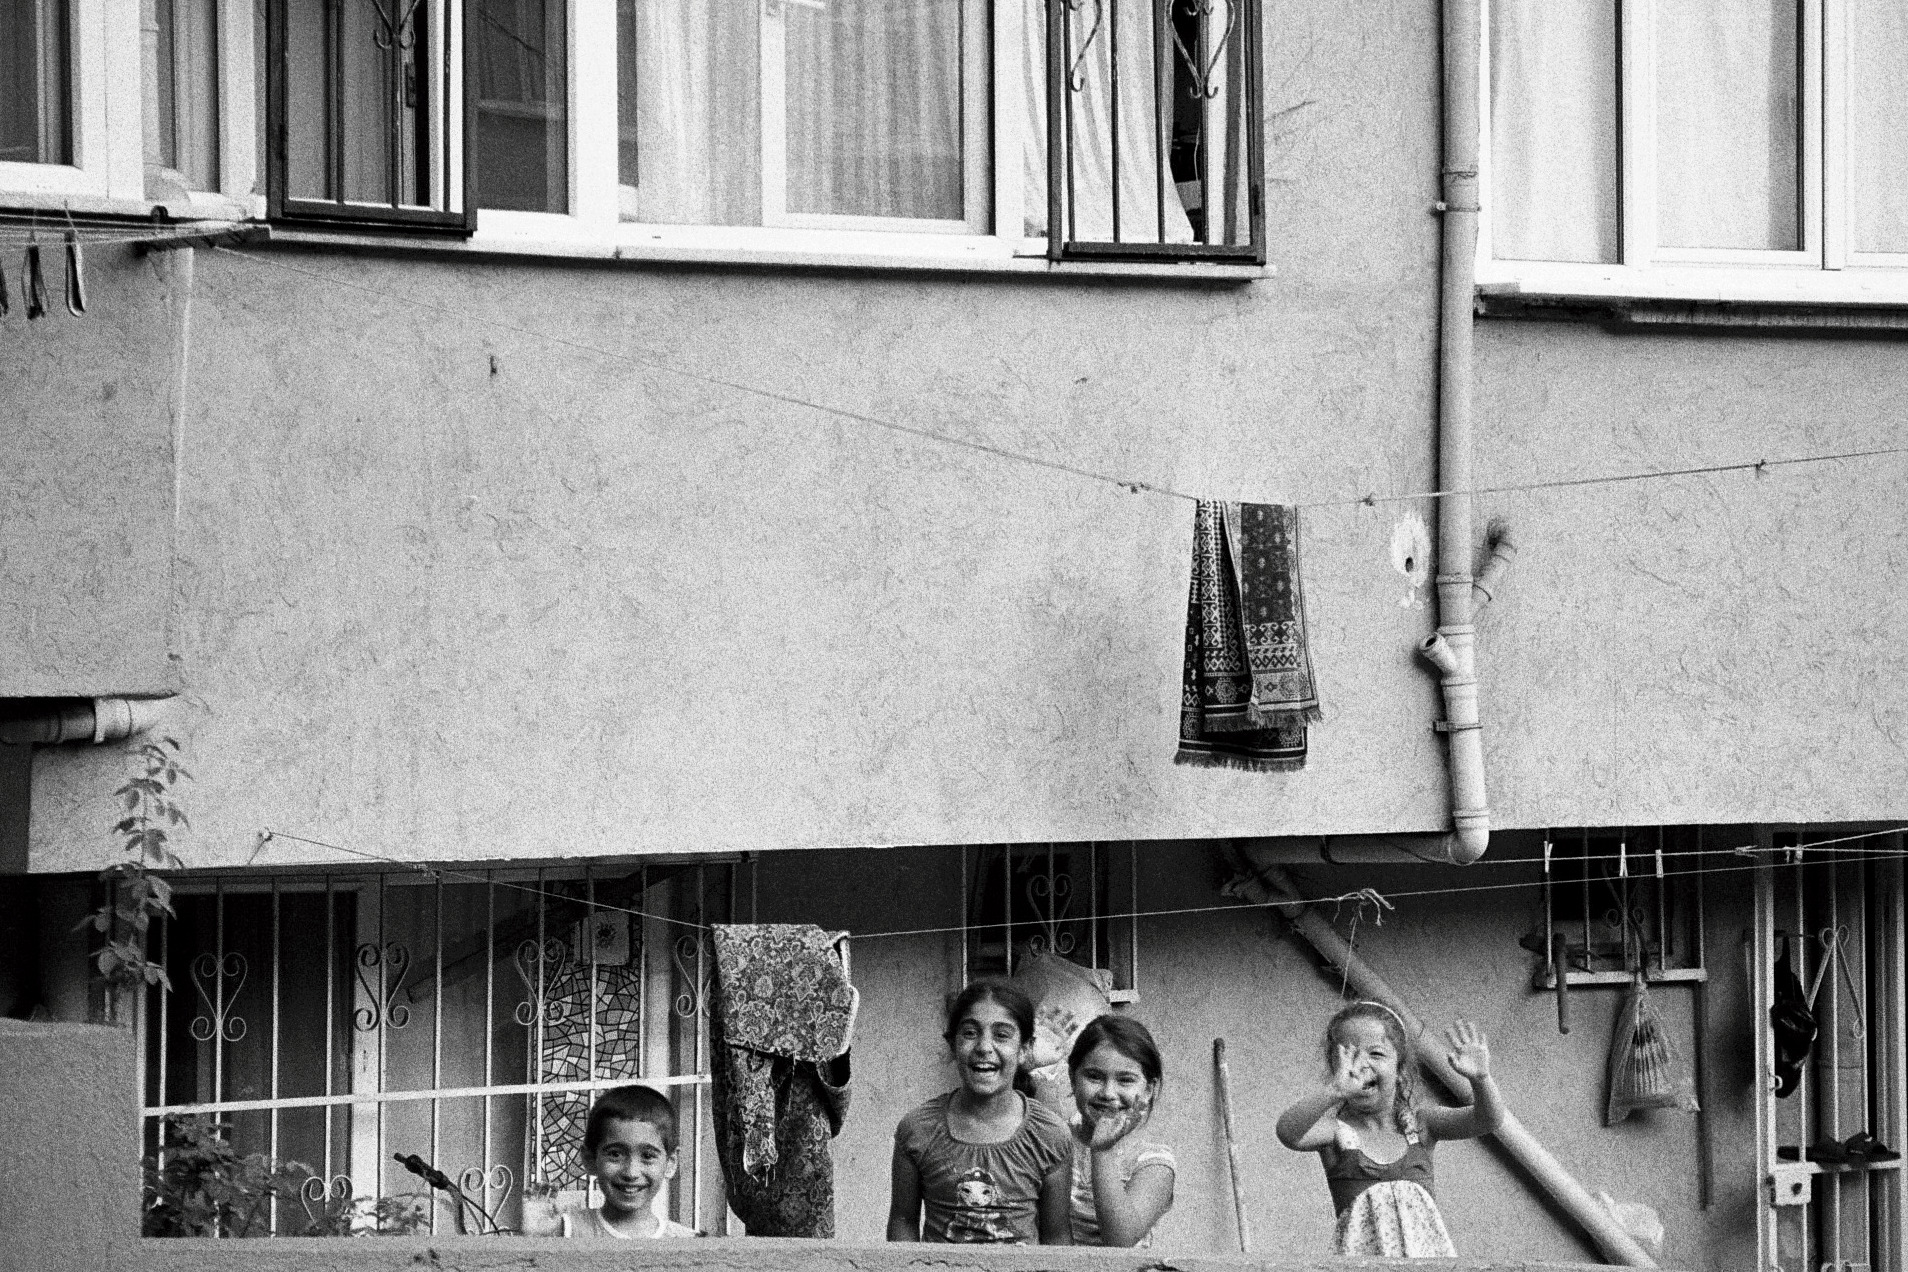 Istanbul smiles